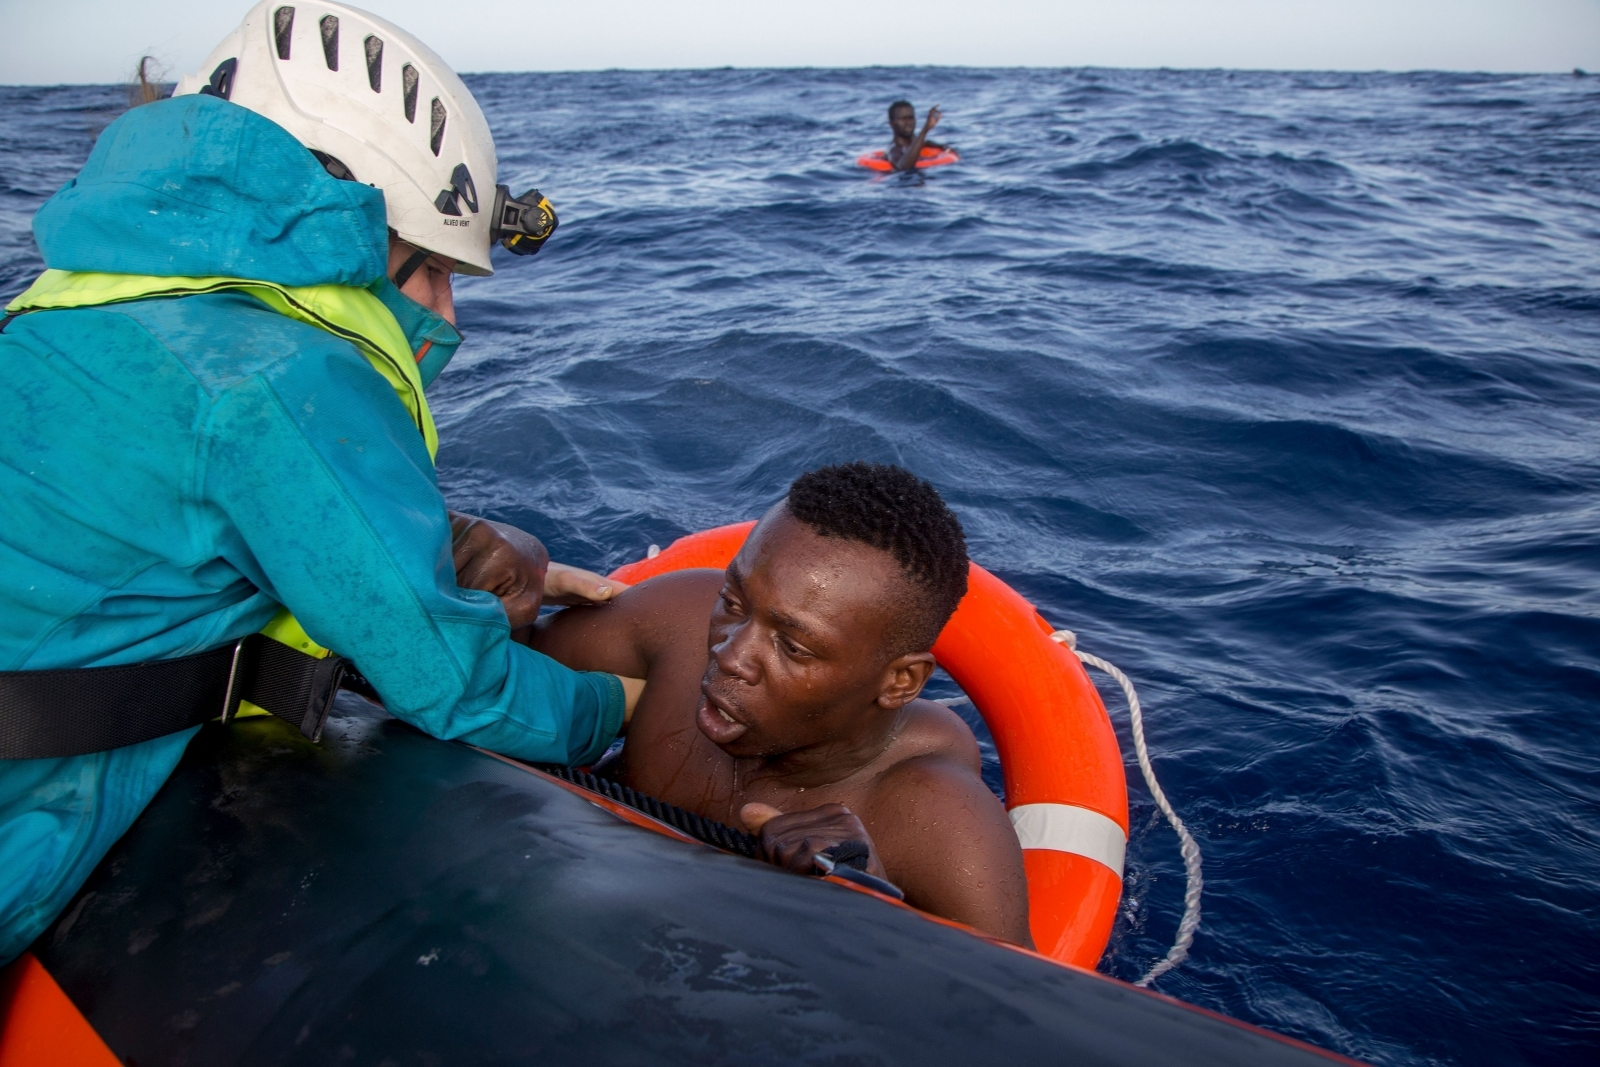 Migrant rescued in the Mediterranean